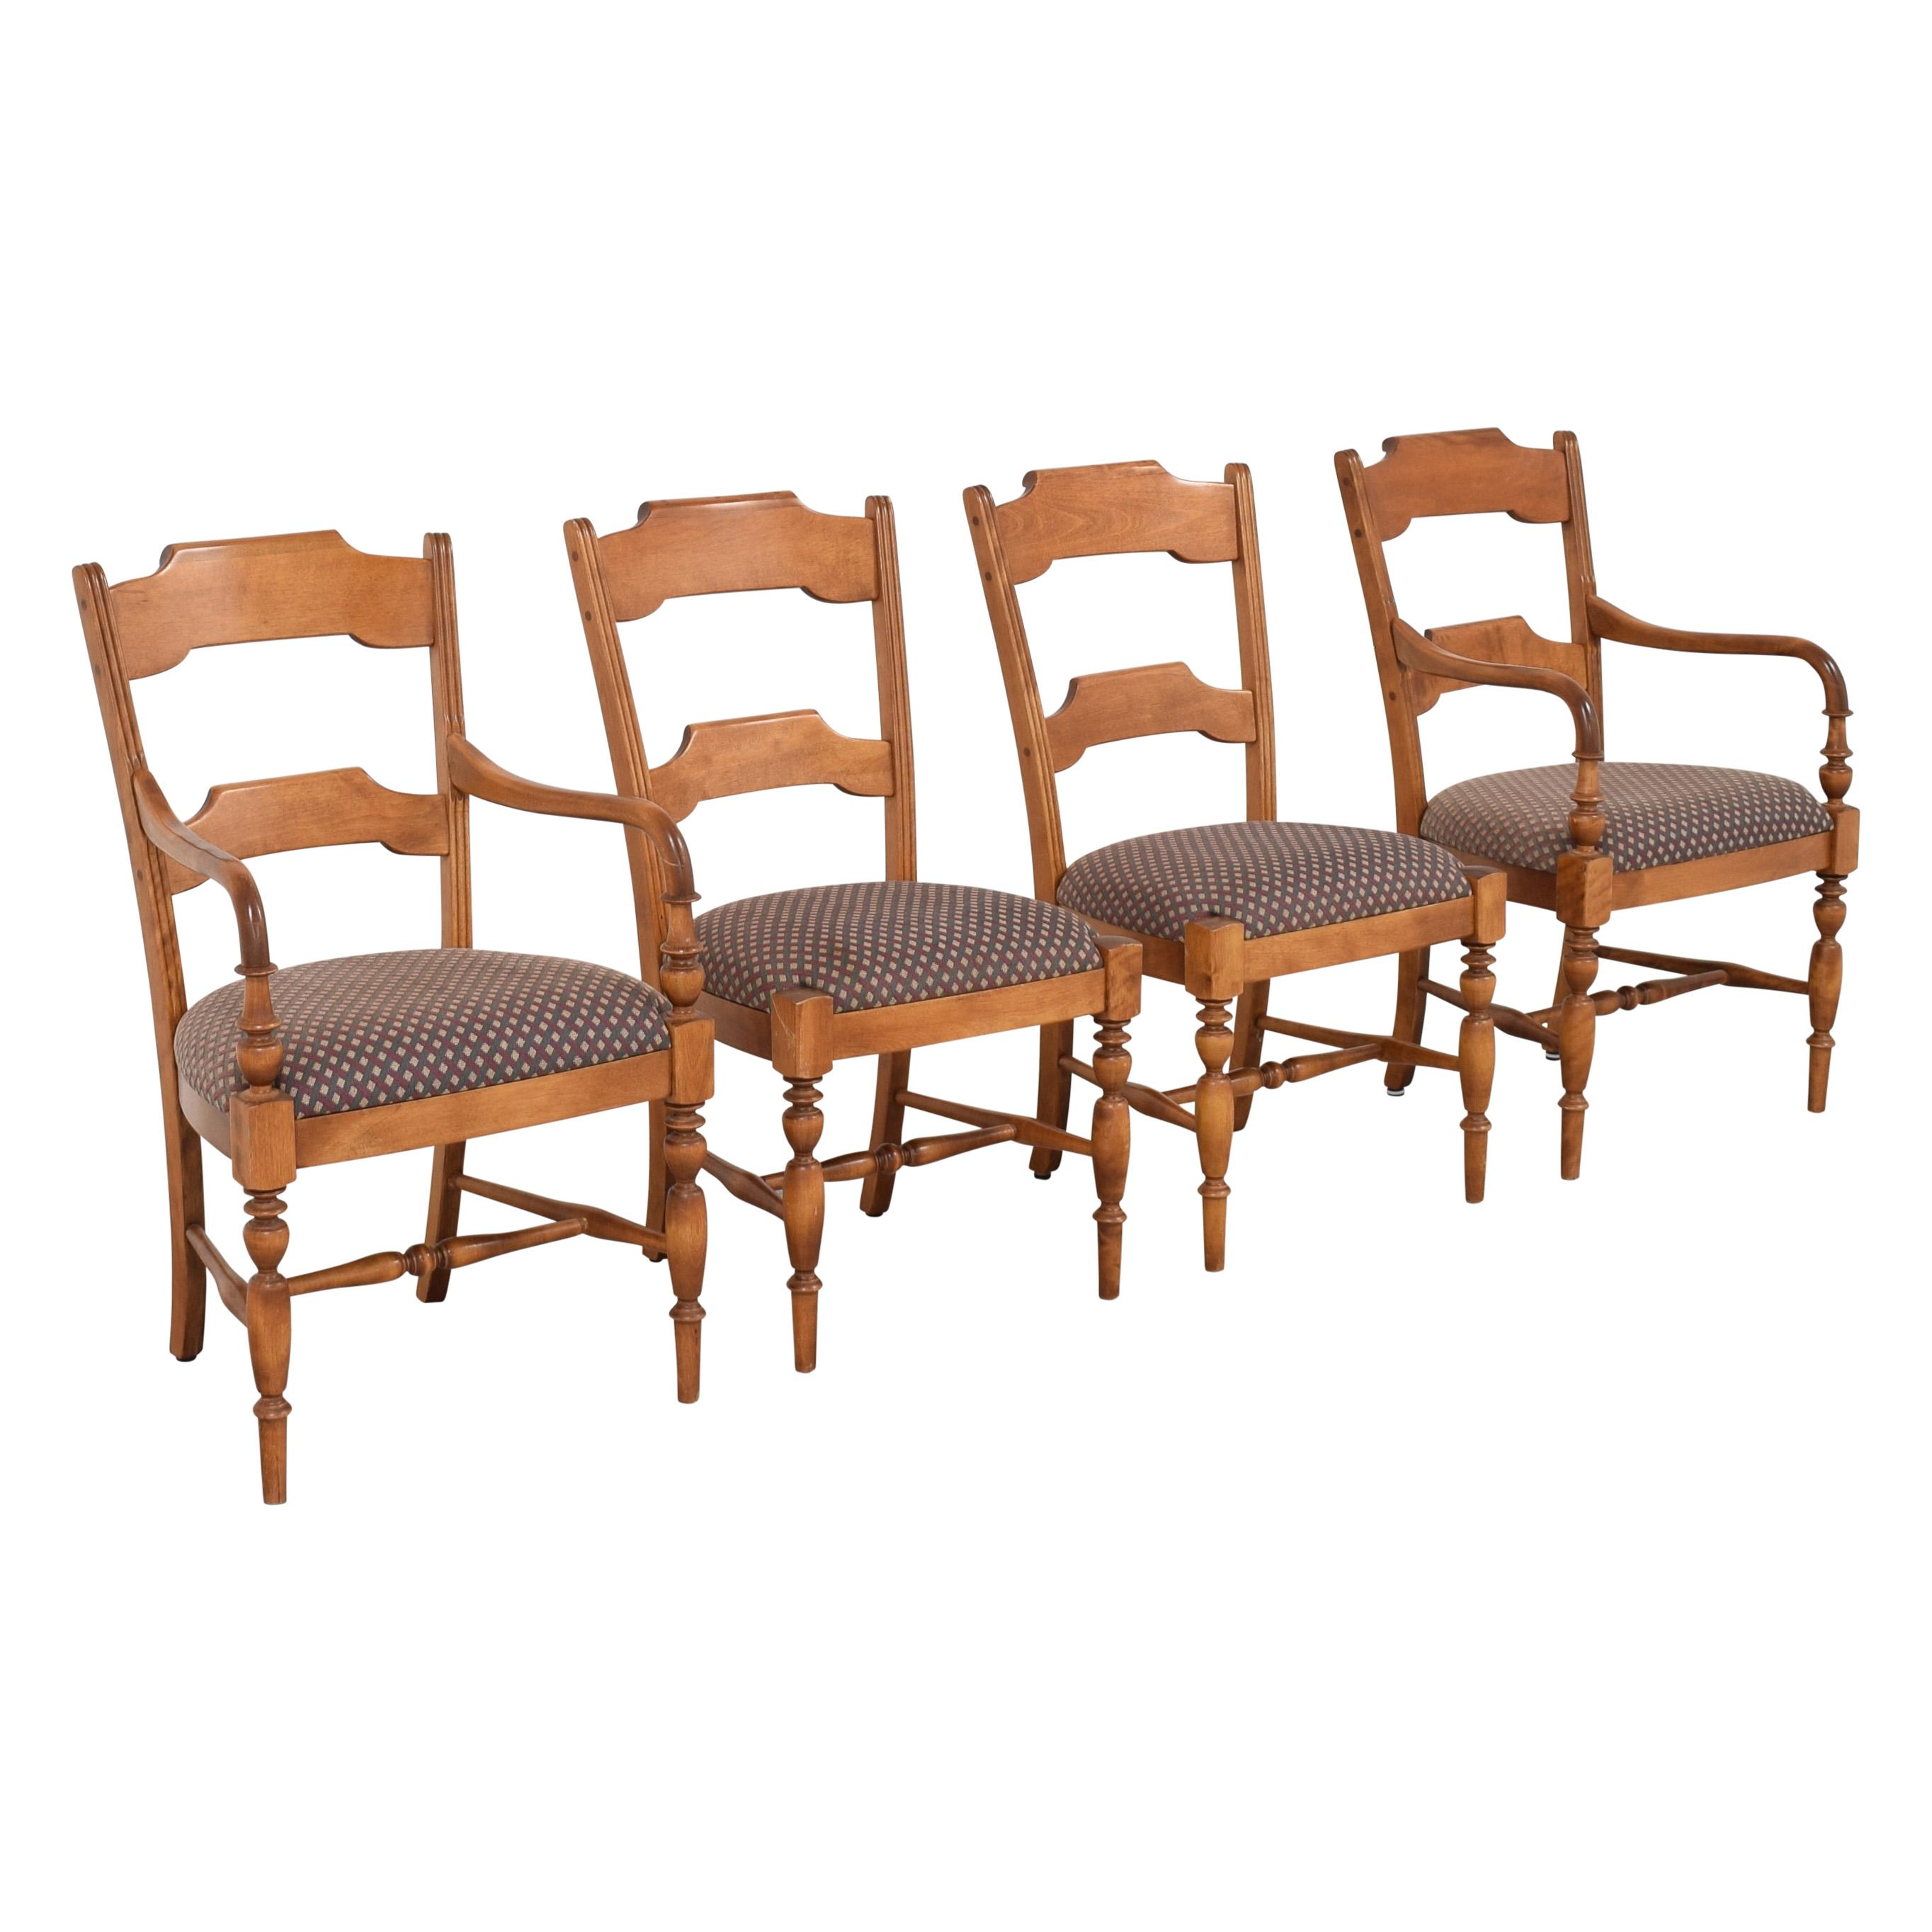 Nichols & Stone Dining Chairs Nichols & Stone